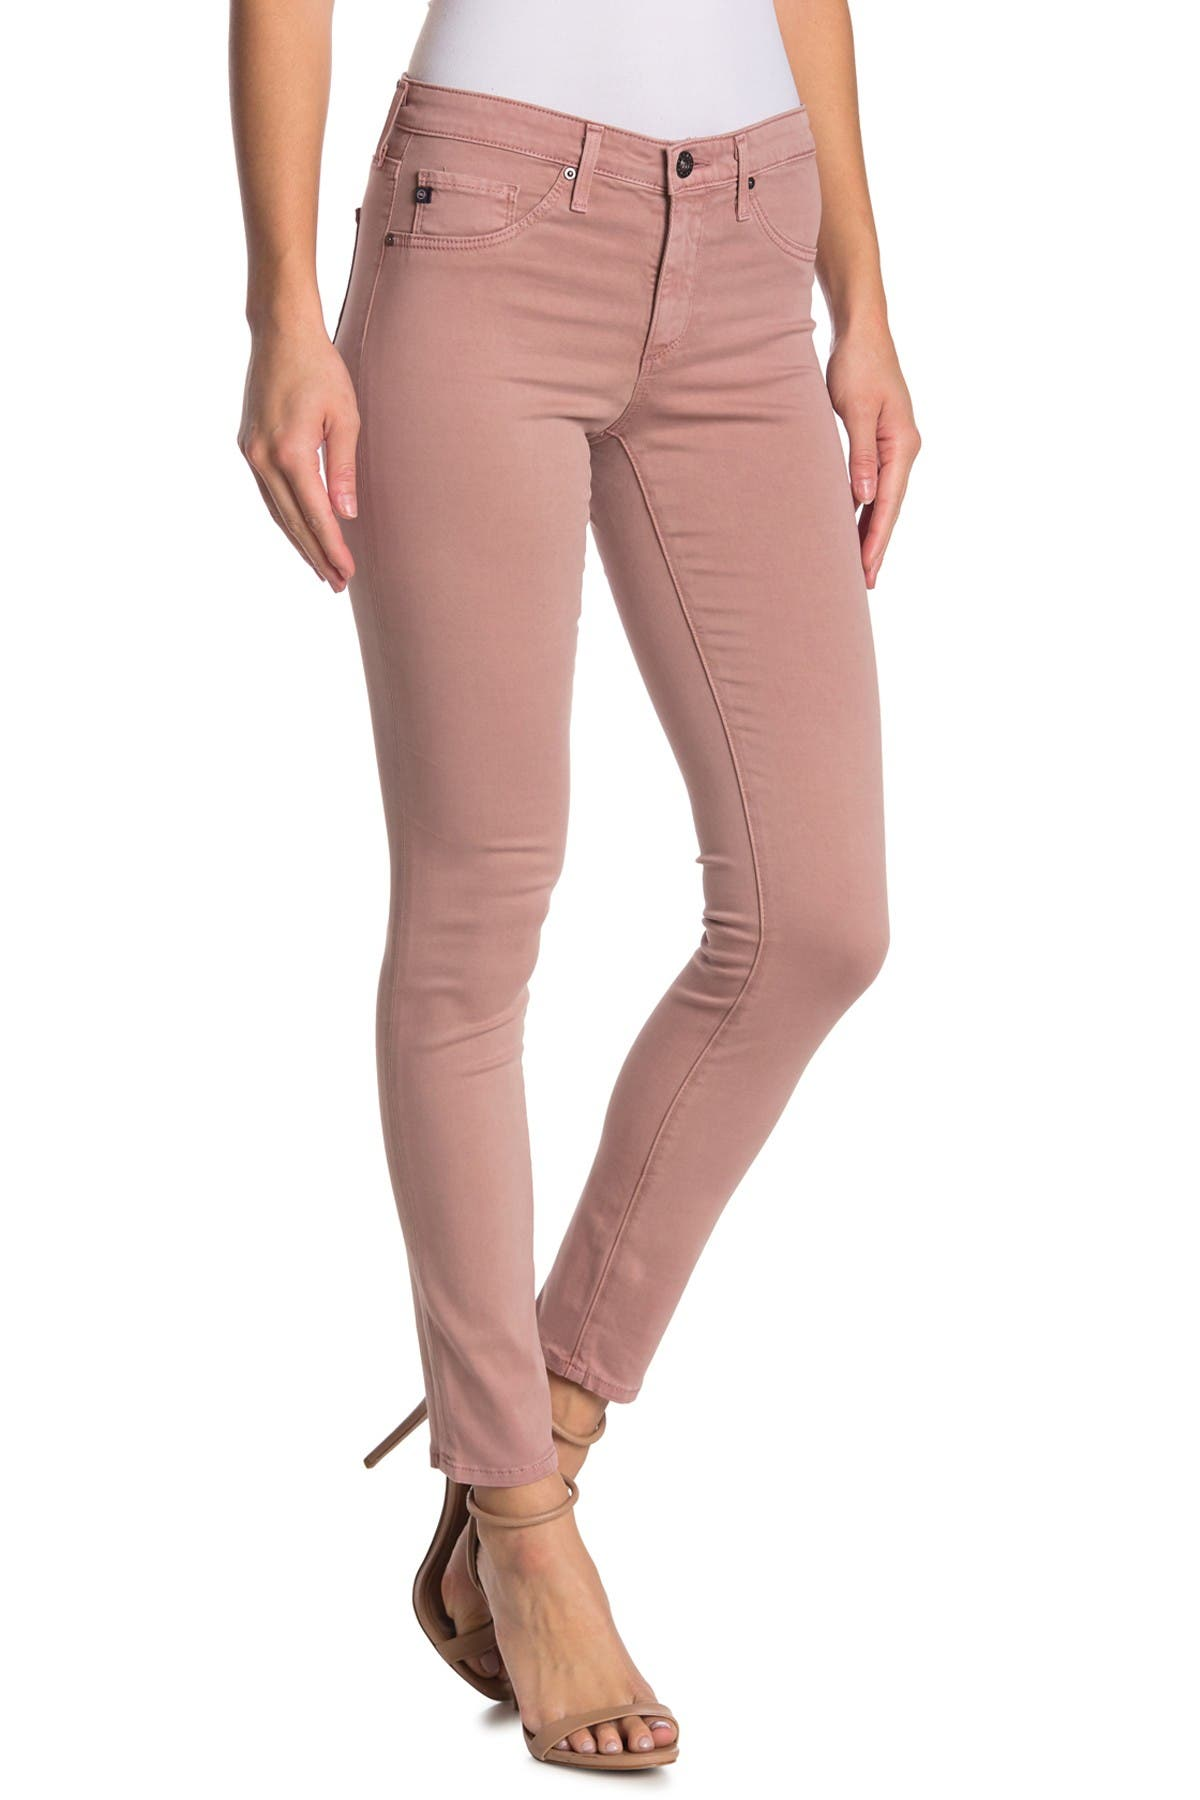 Image of AG Legging Super Skinny Ankle Jeans